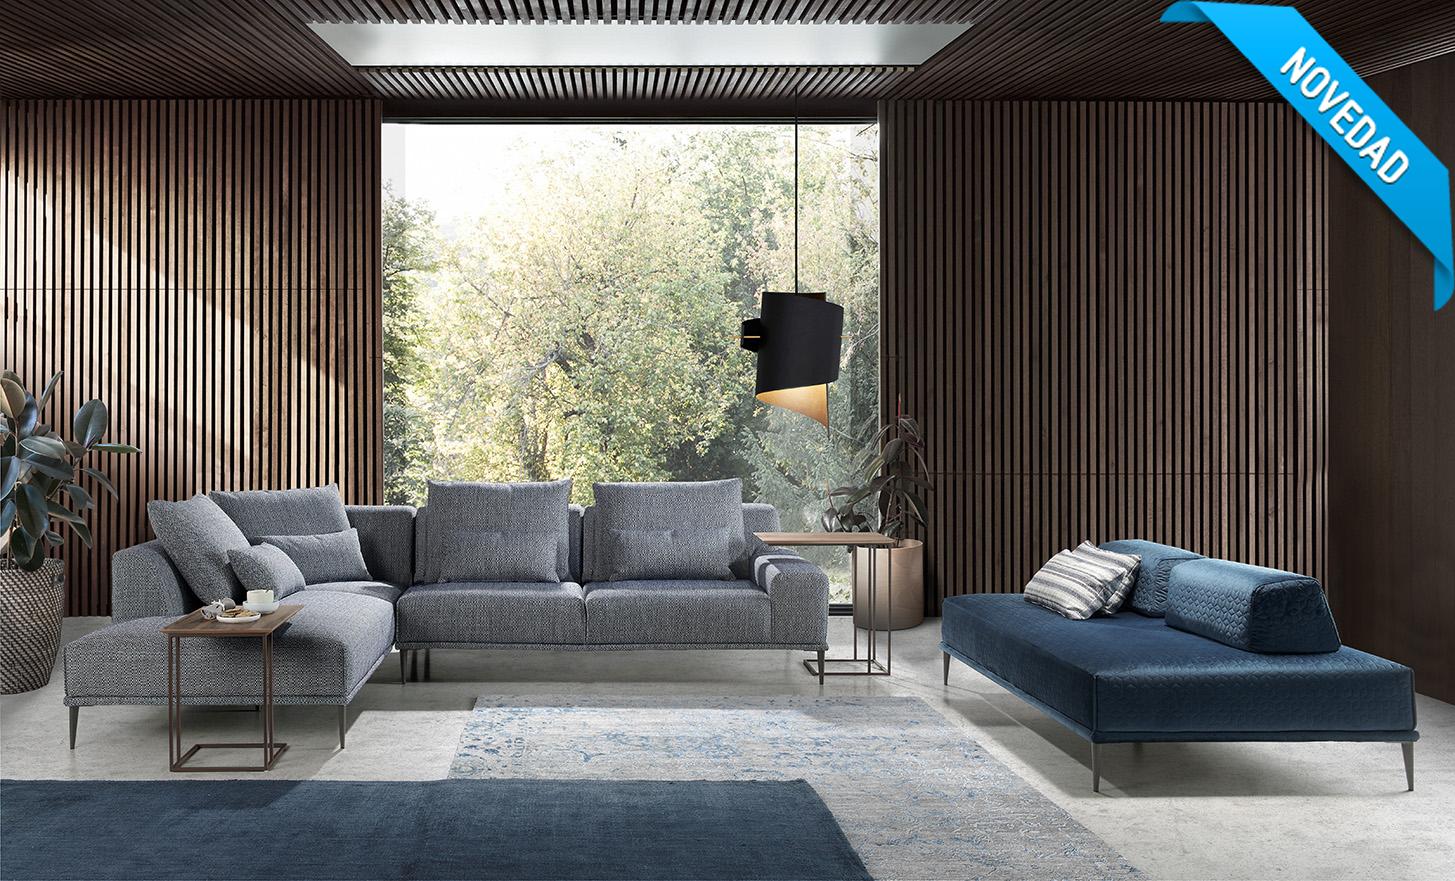 Muebles Sofás y Chaiselonge sofa afosxsofa dove